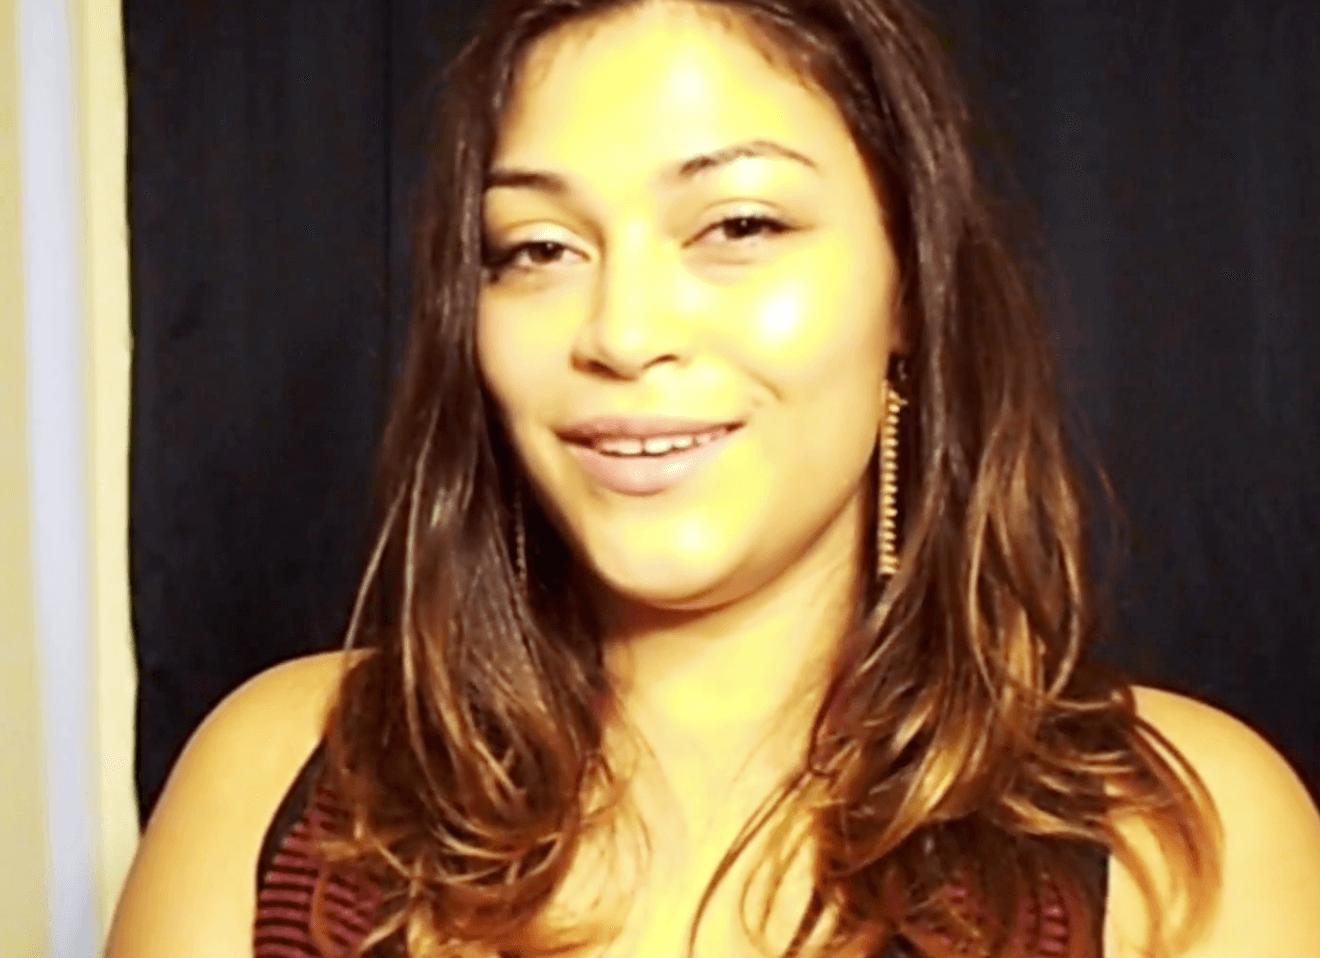 Alisa Velasquez testimonial